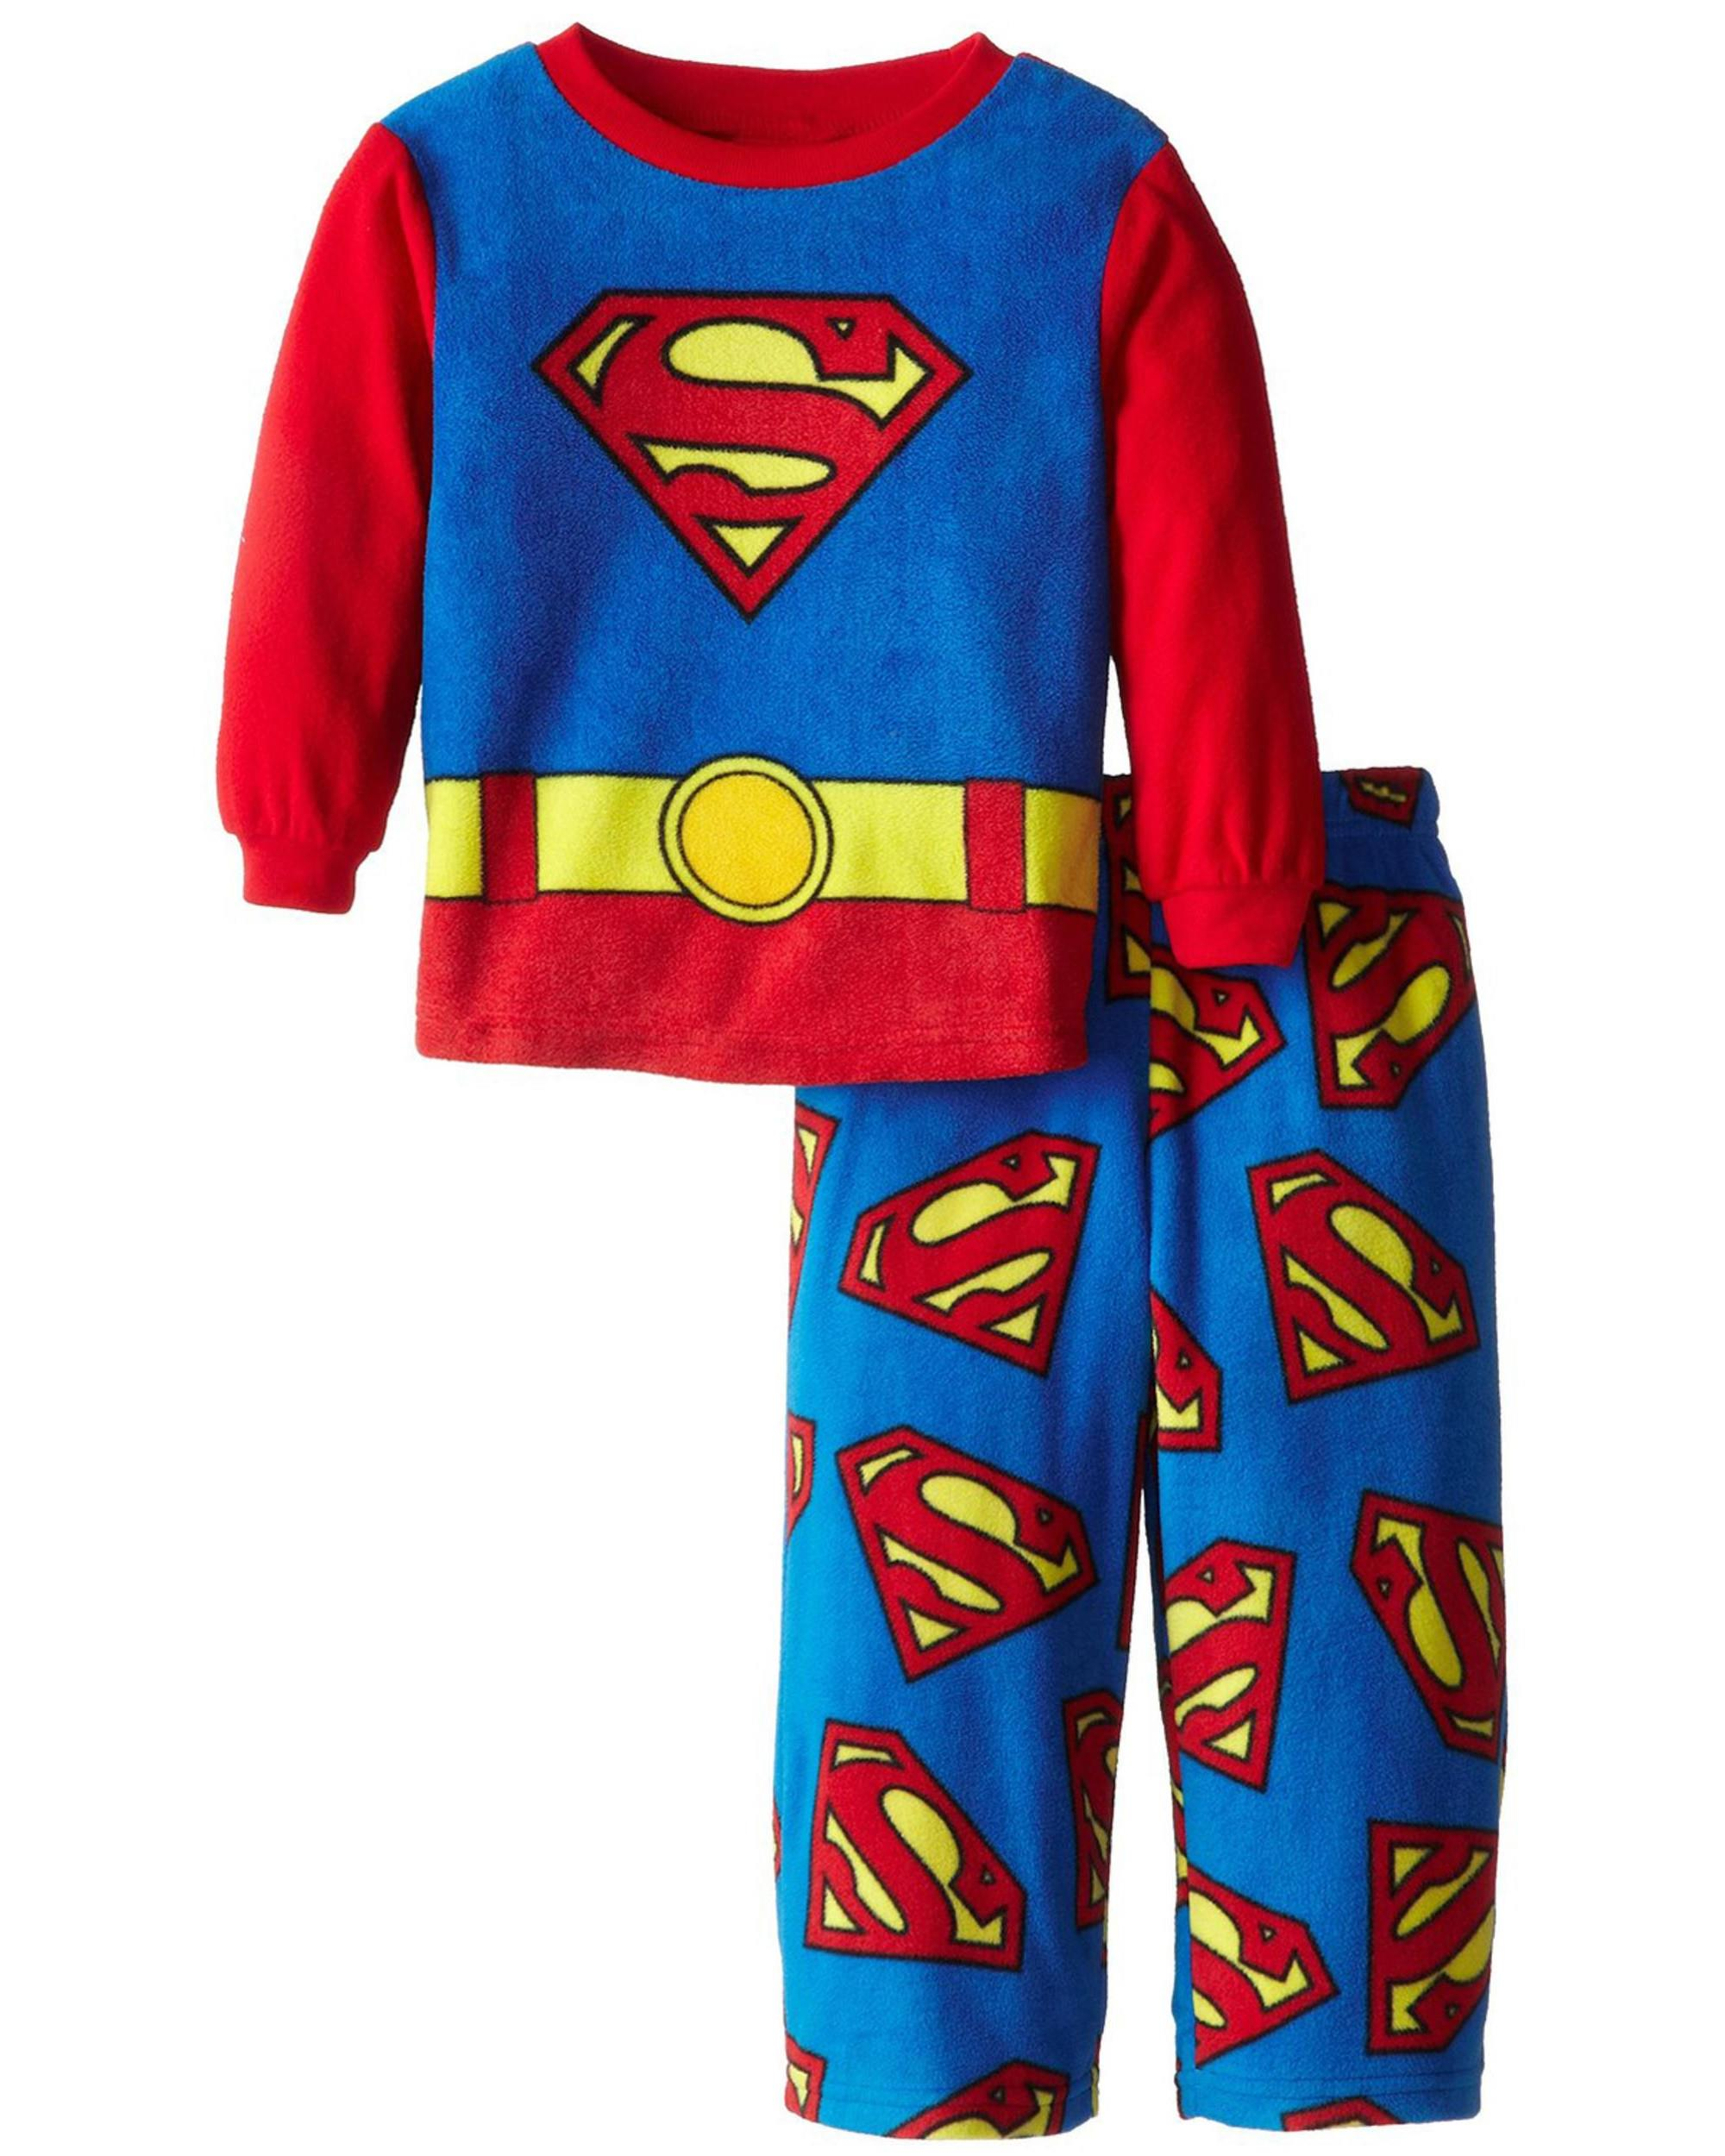 DC Comics Superman Fleece Boys Pajama Set, Sizes 4-10, Blue, Size: 8